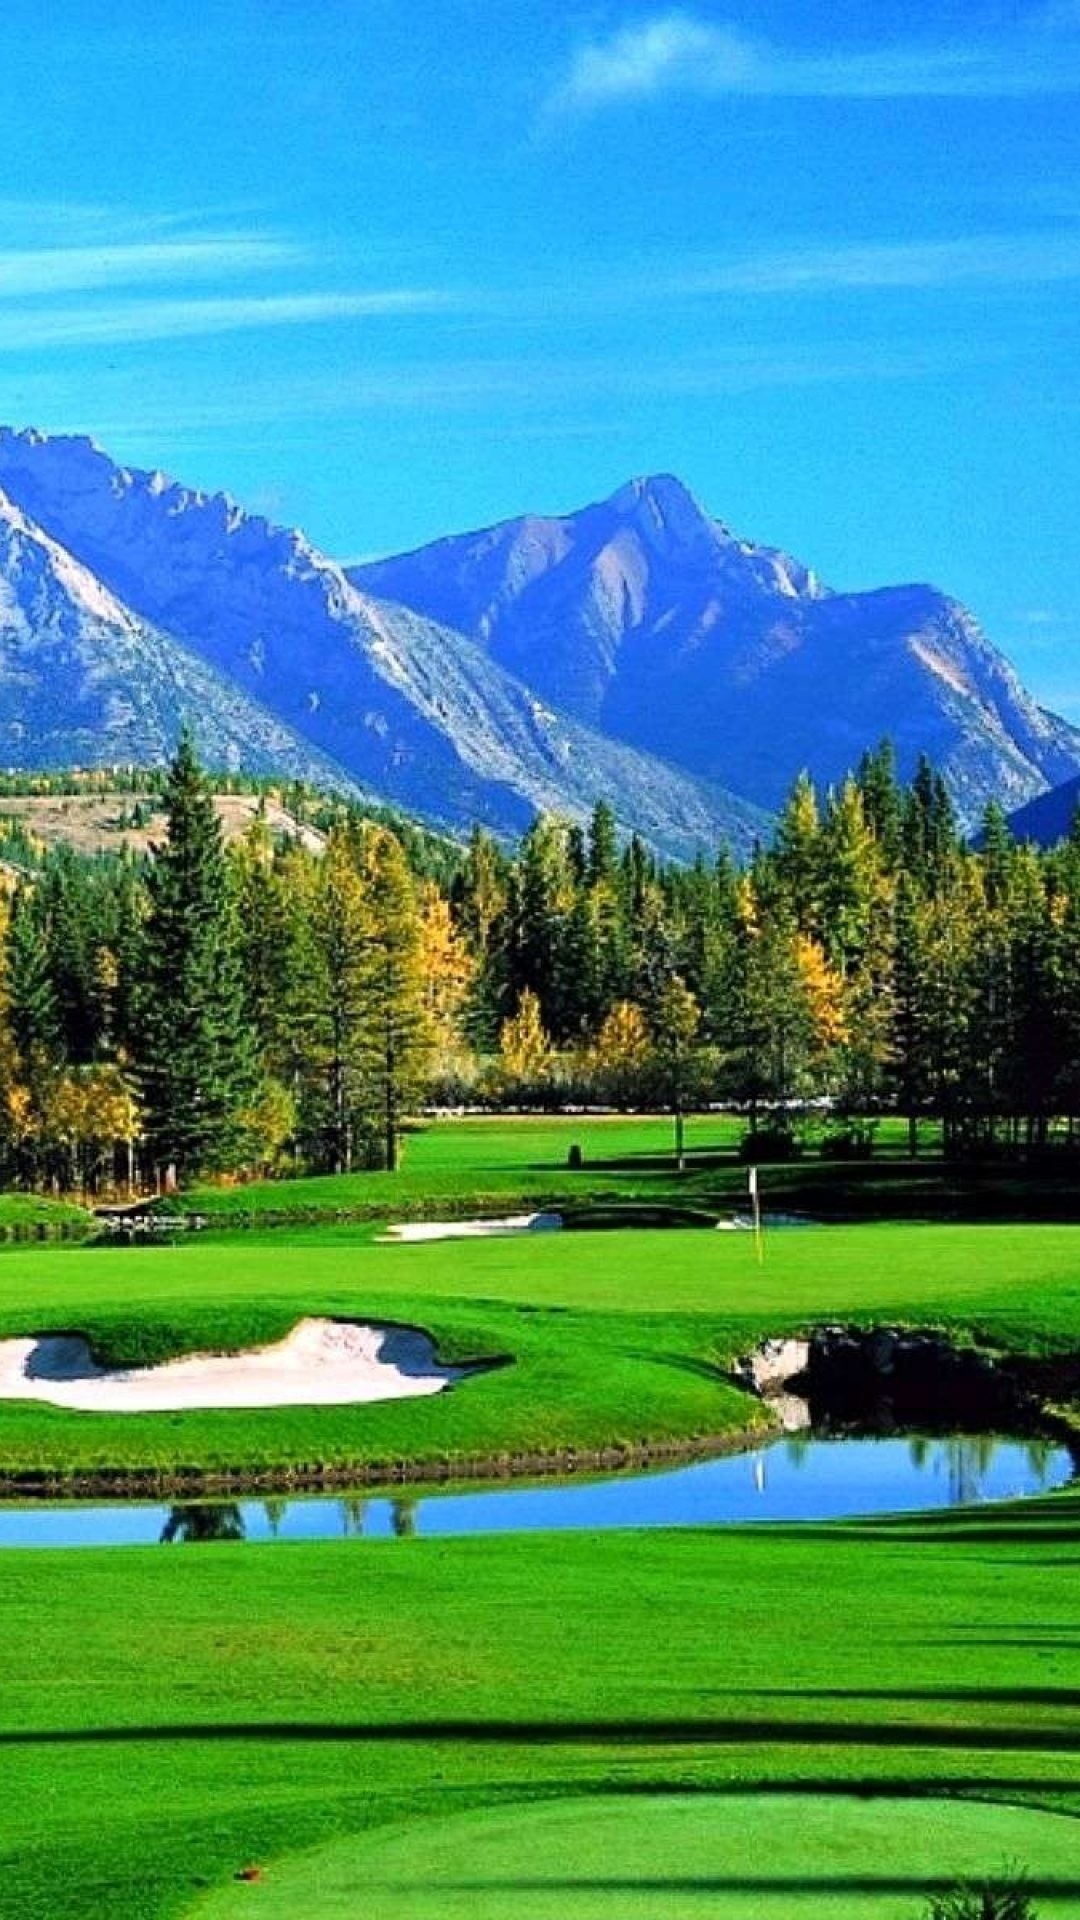 56 Iphone Golf